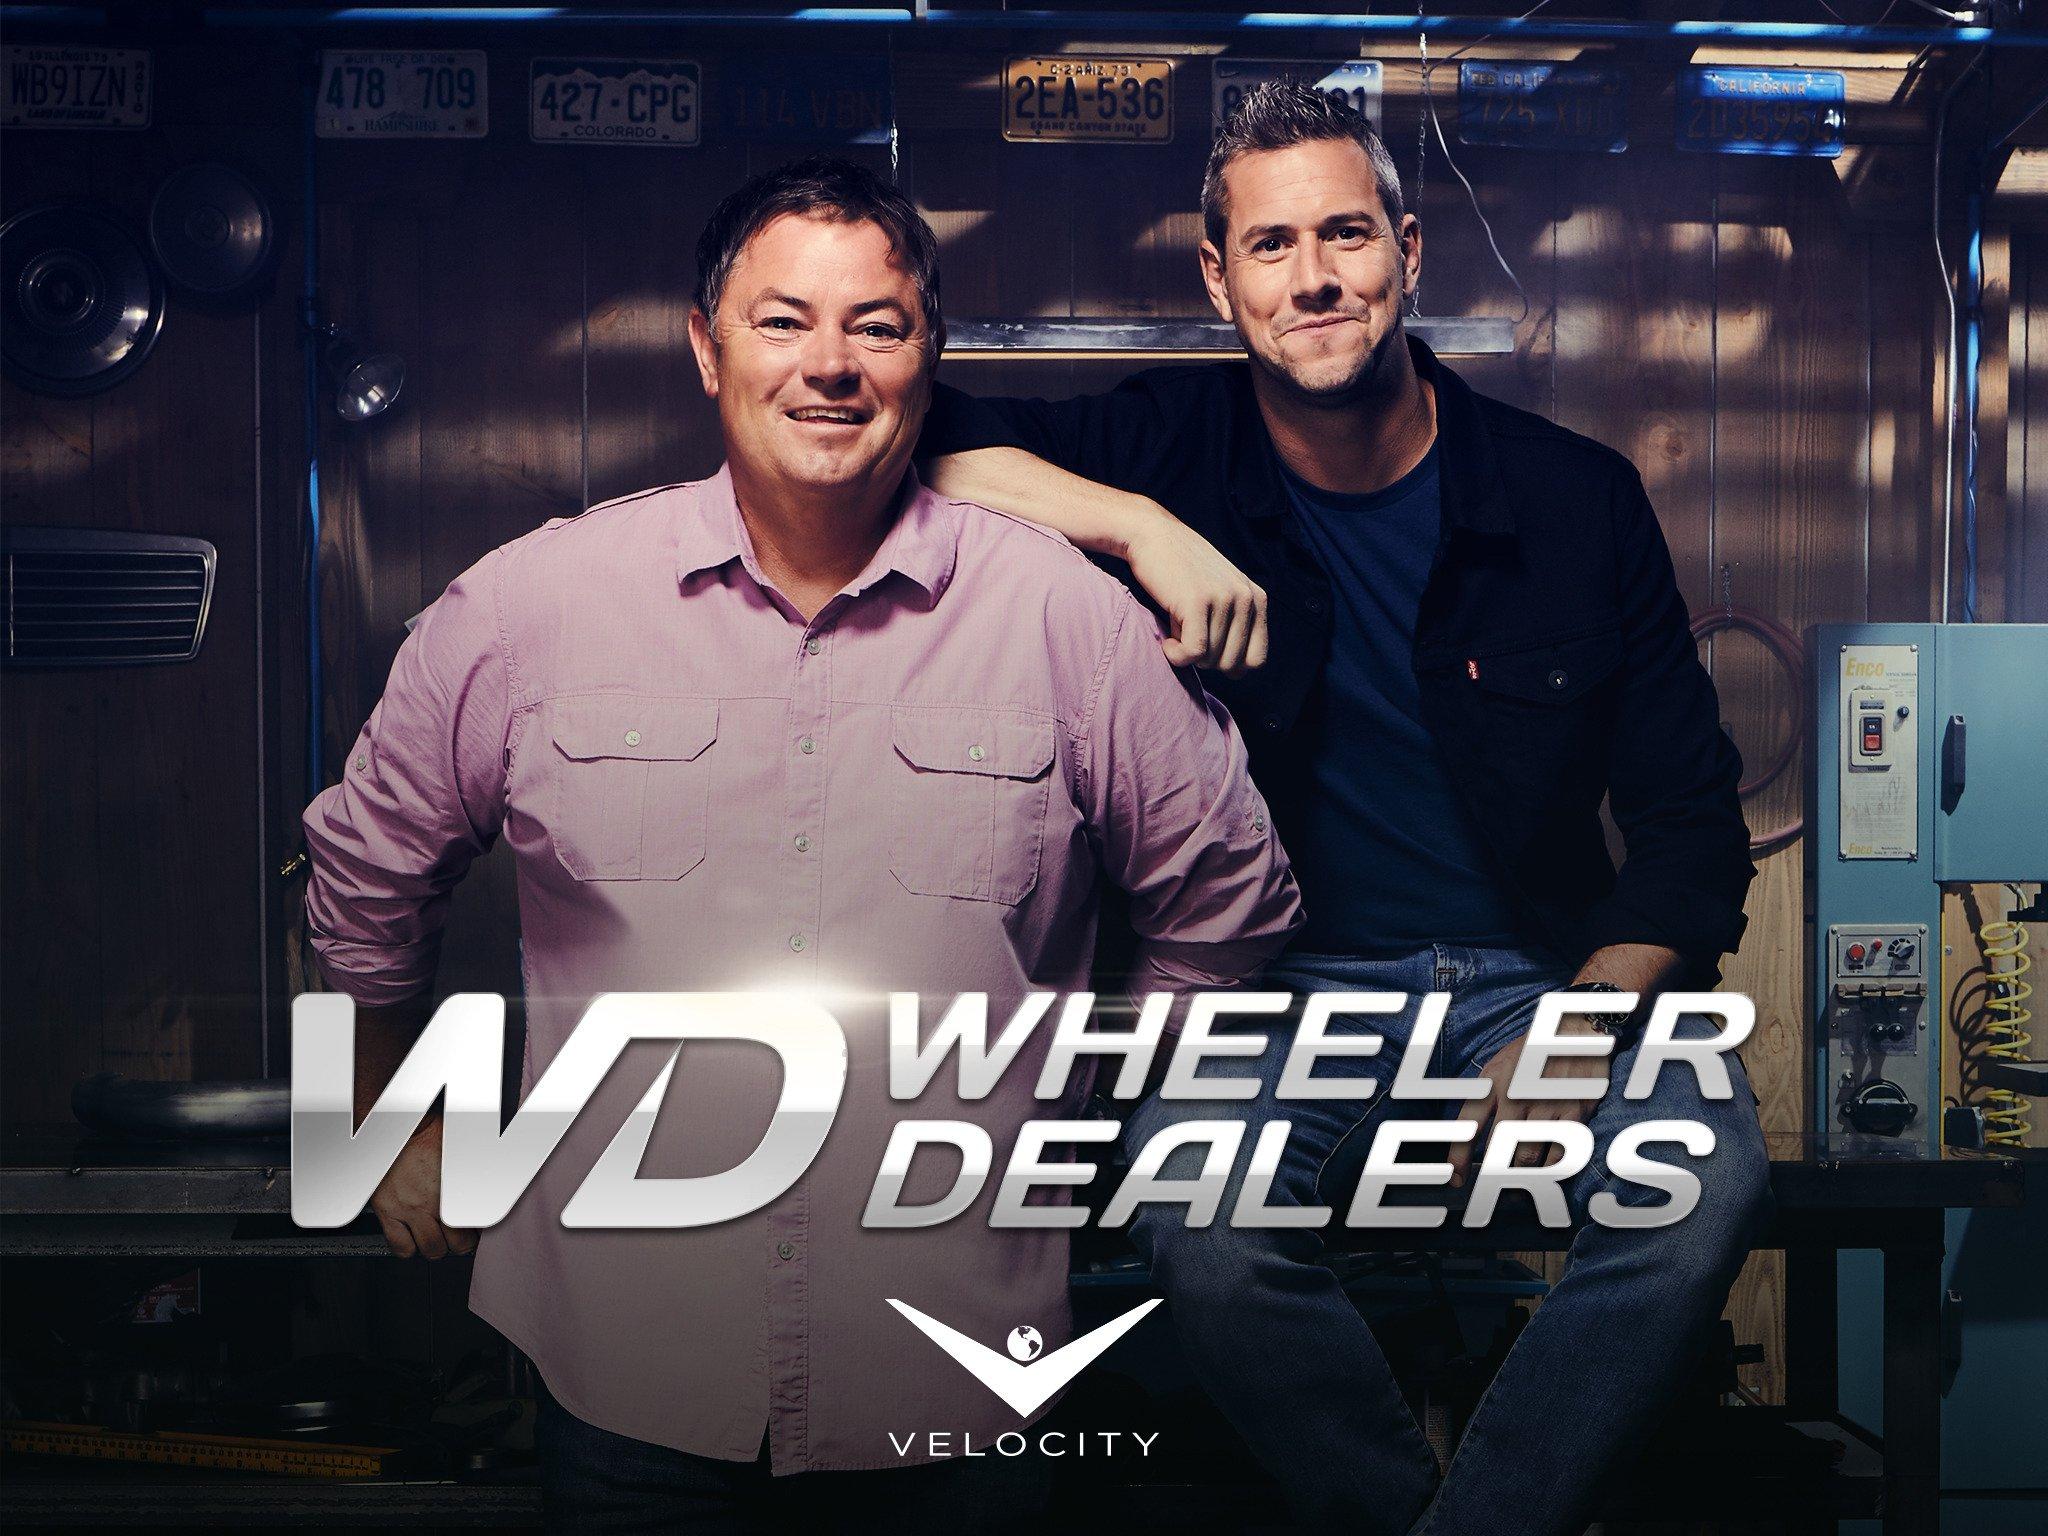 wheeler dealers season 11 episode 15